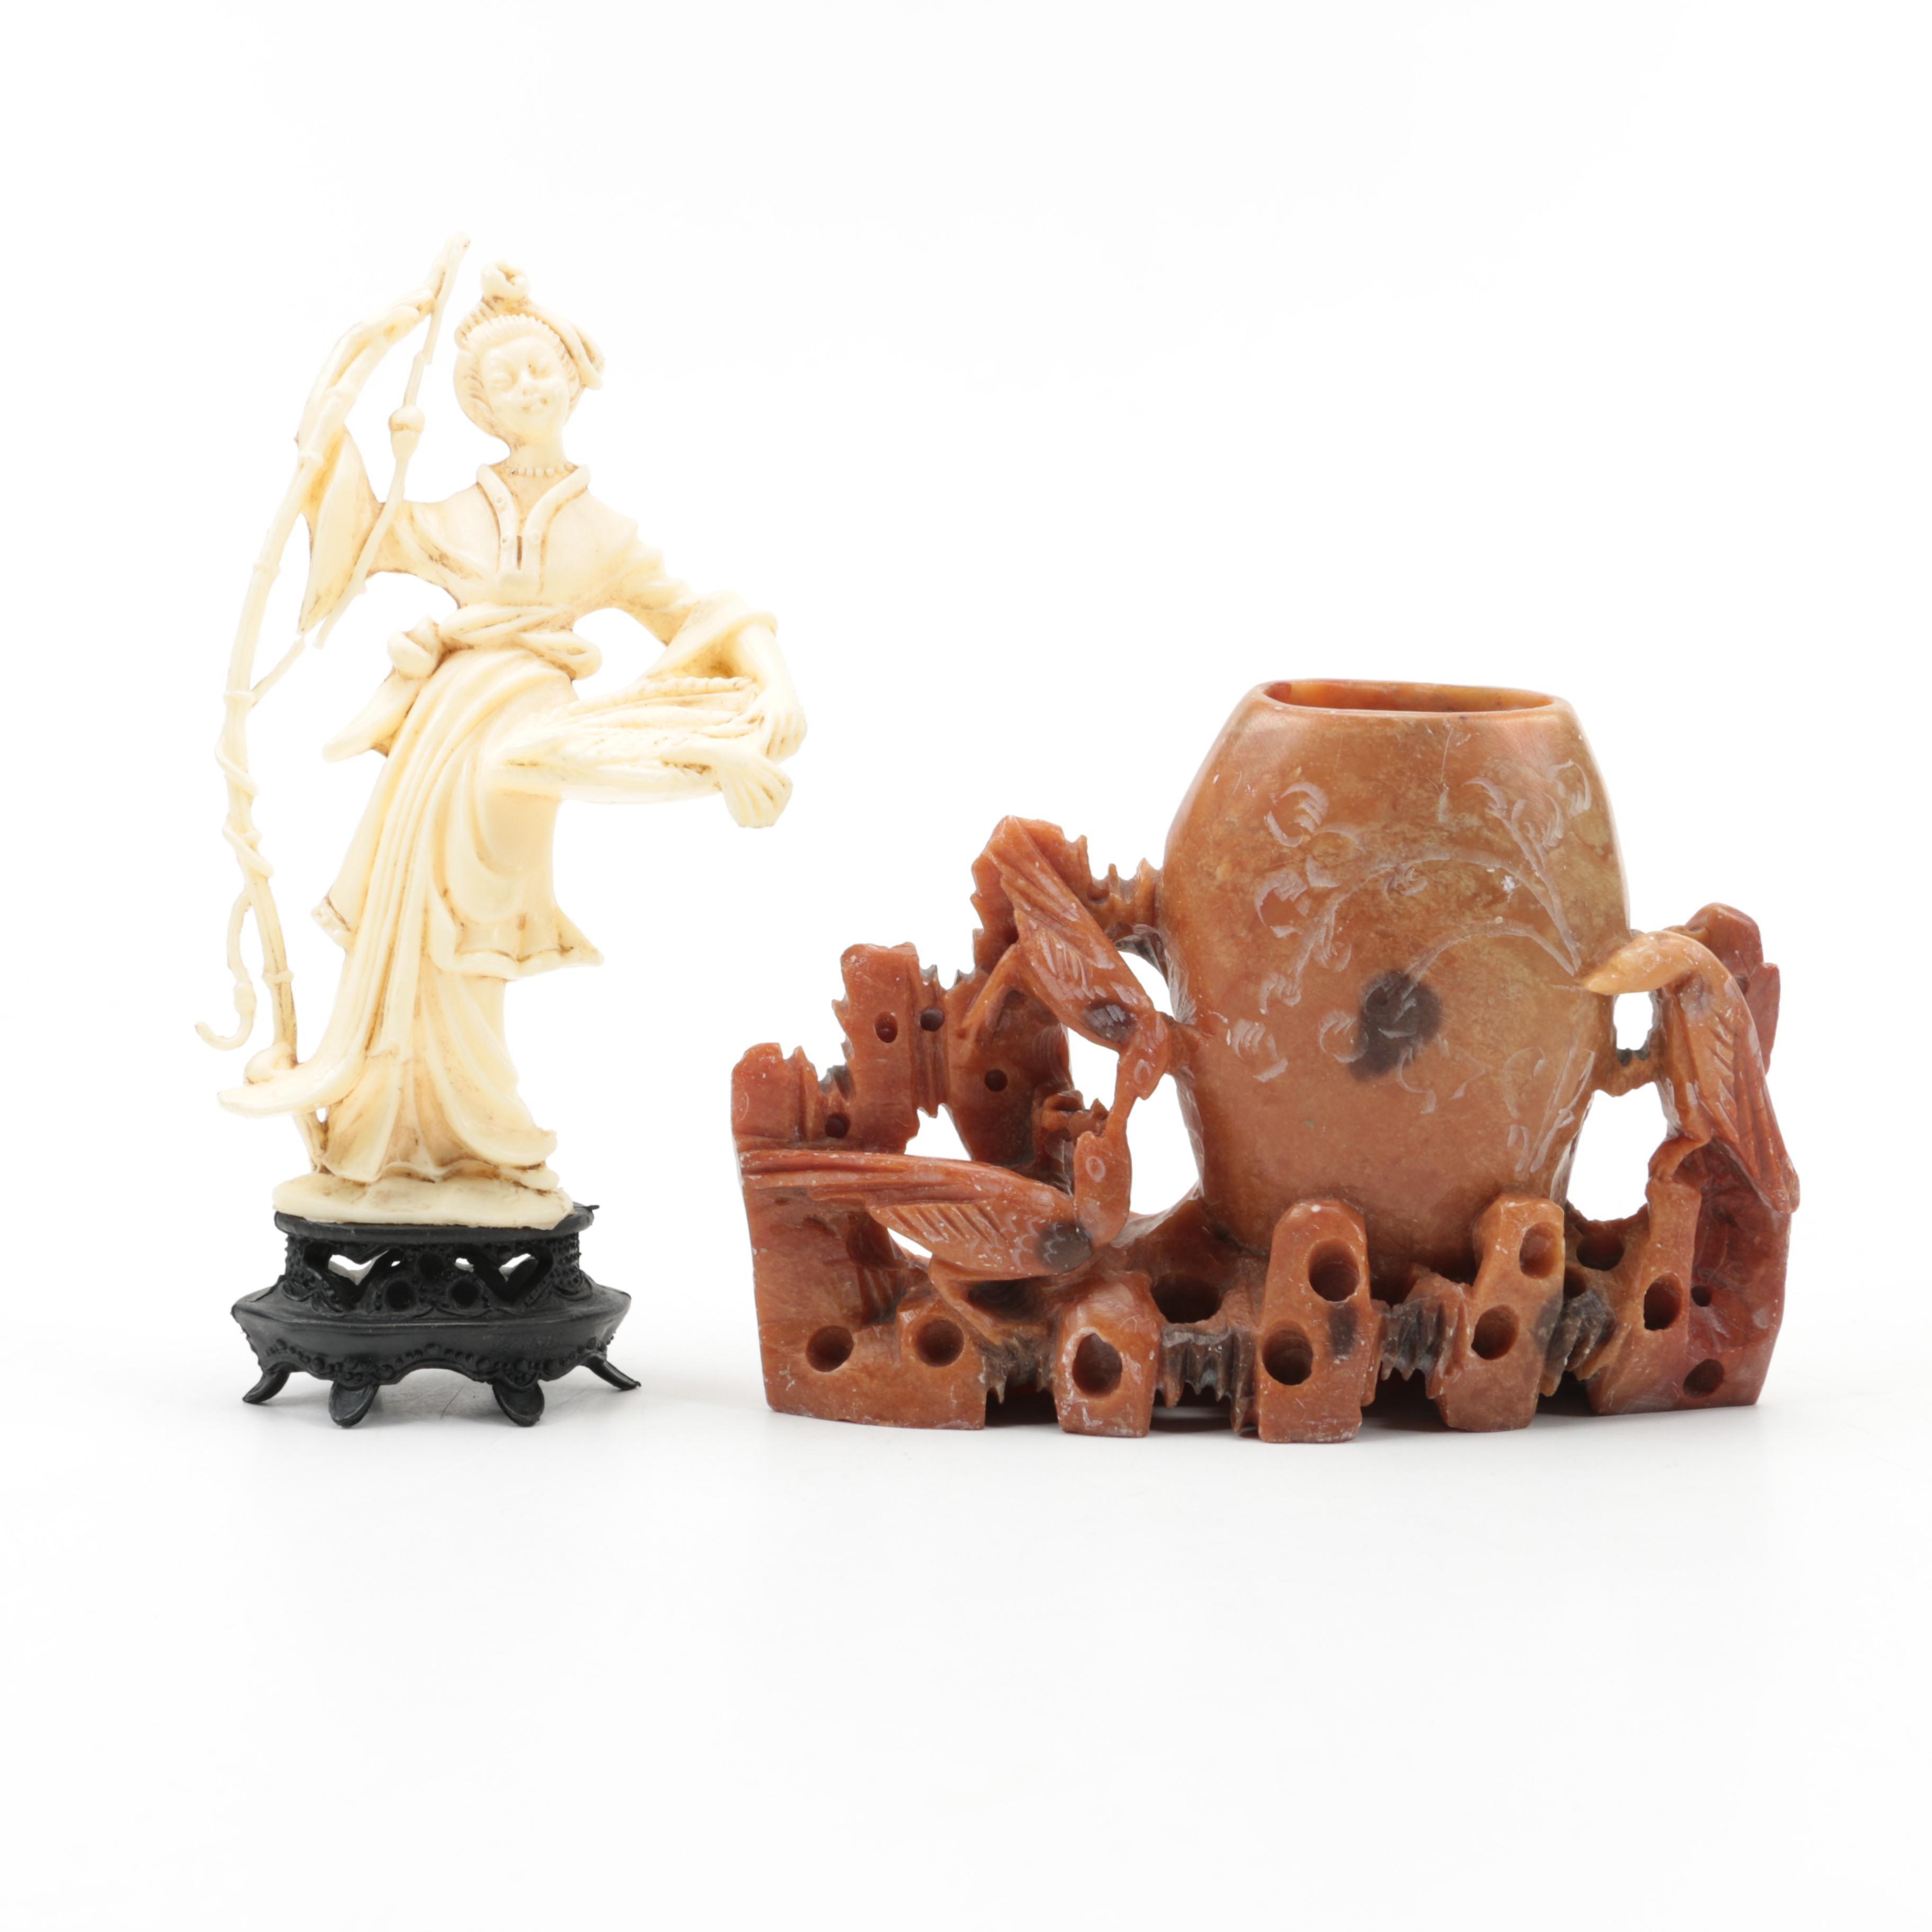 Soapstone Vase with Plastic Figurine